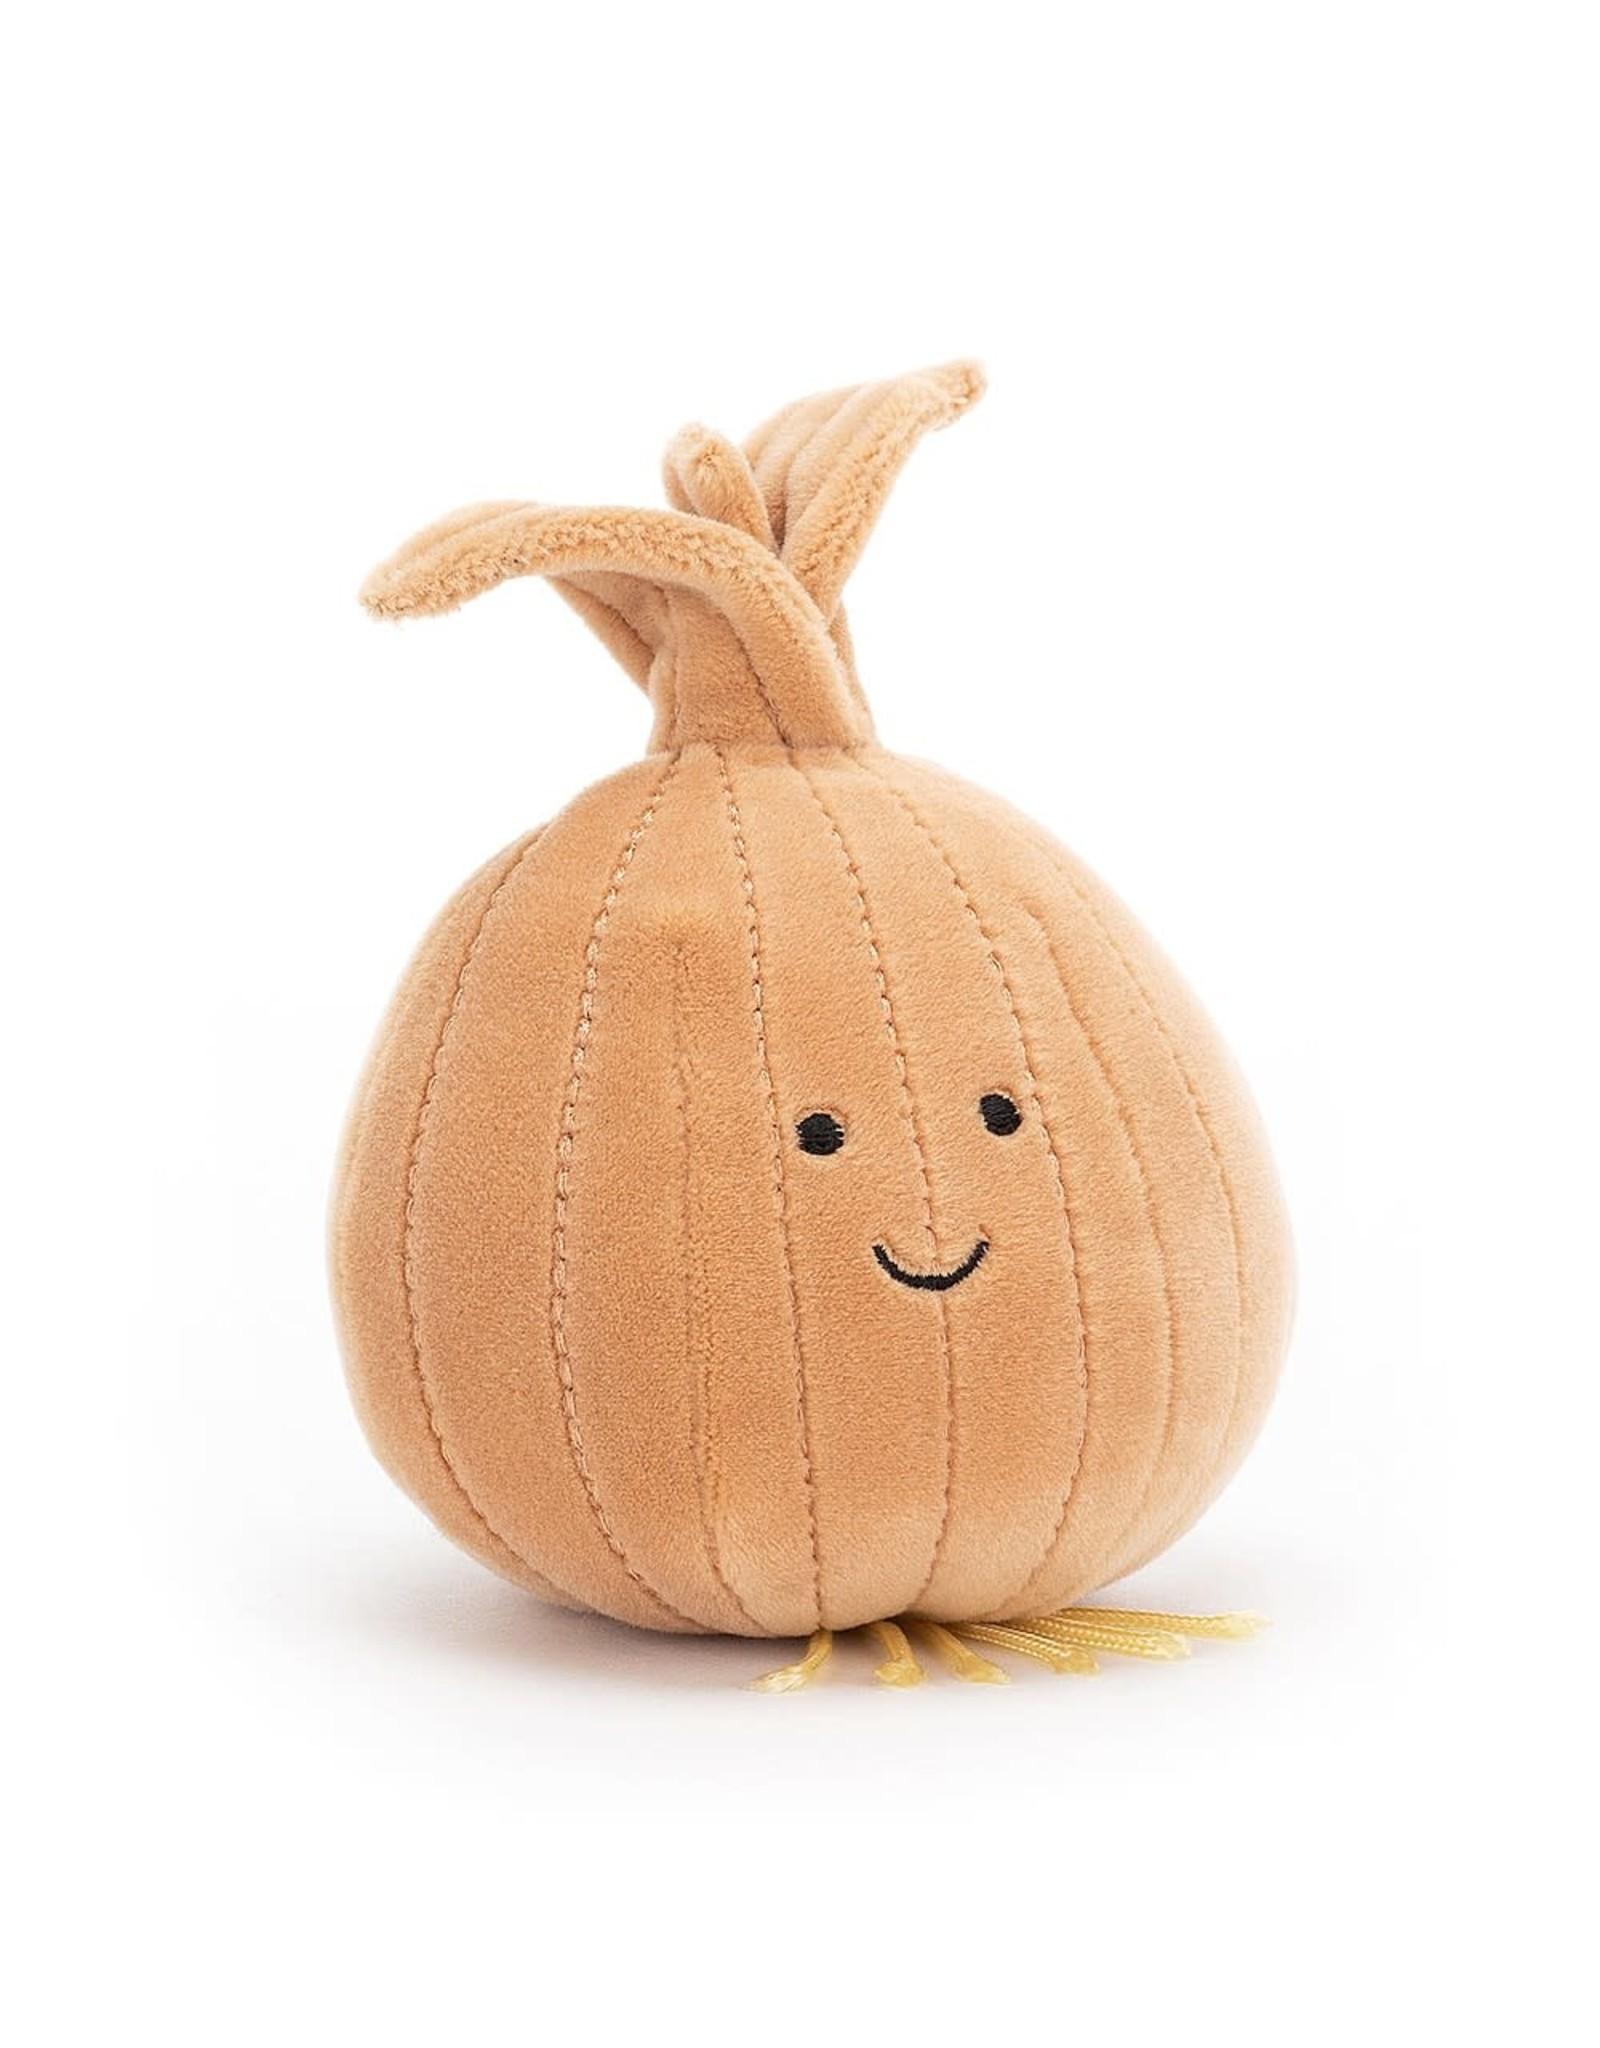 Jelly Cat Vivacious Vegetable Onion